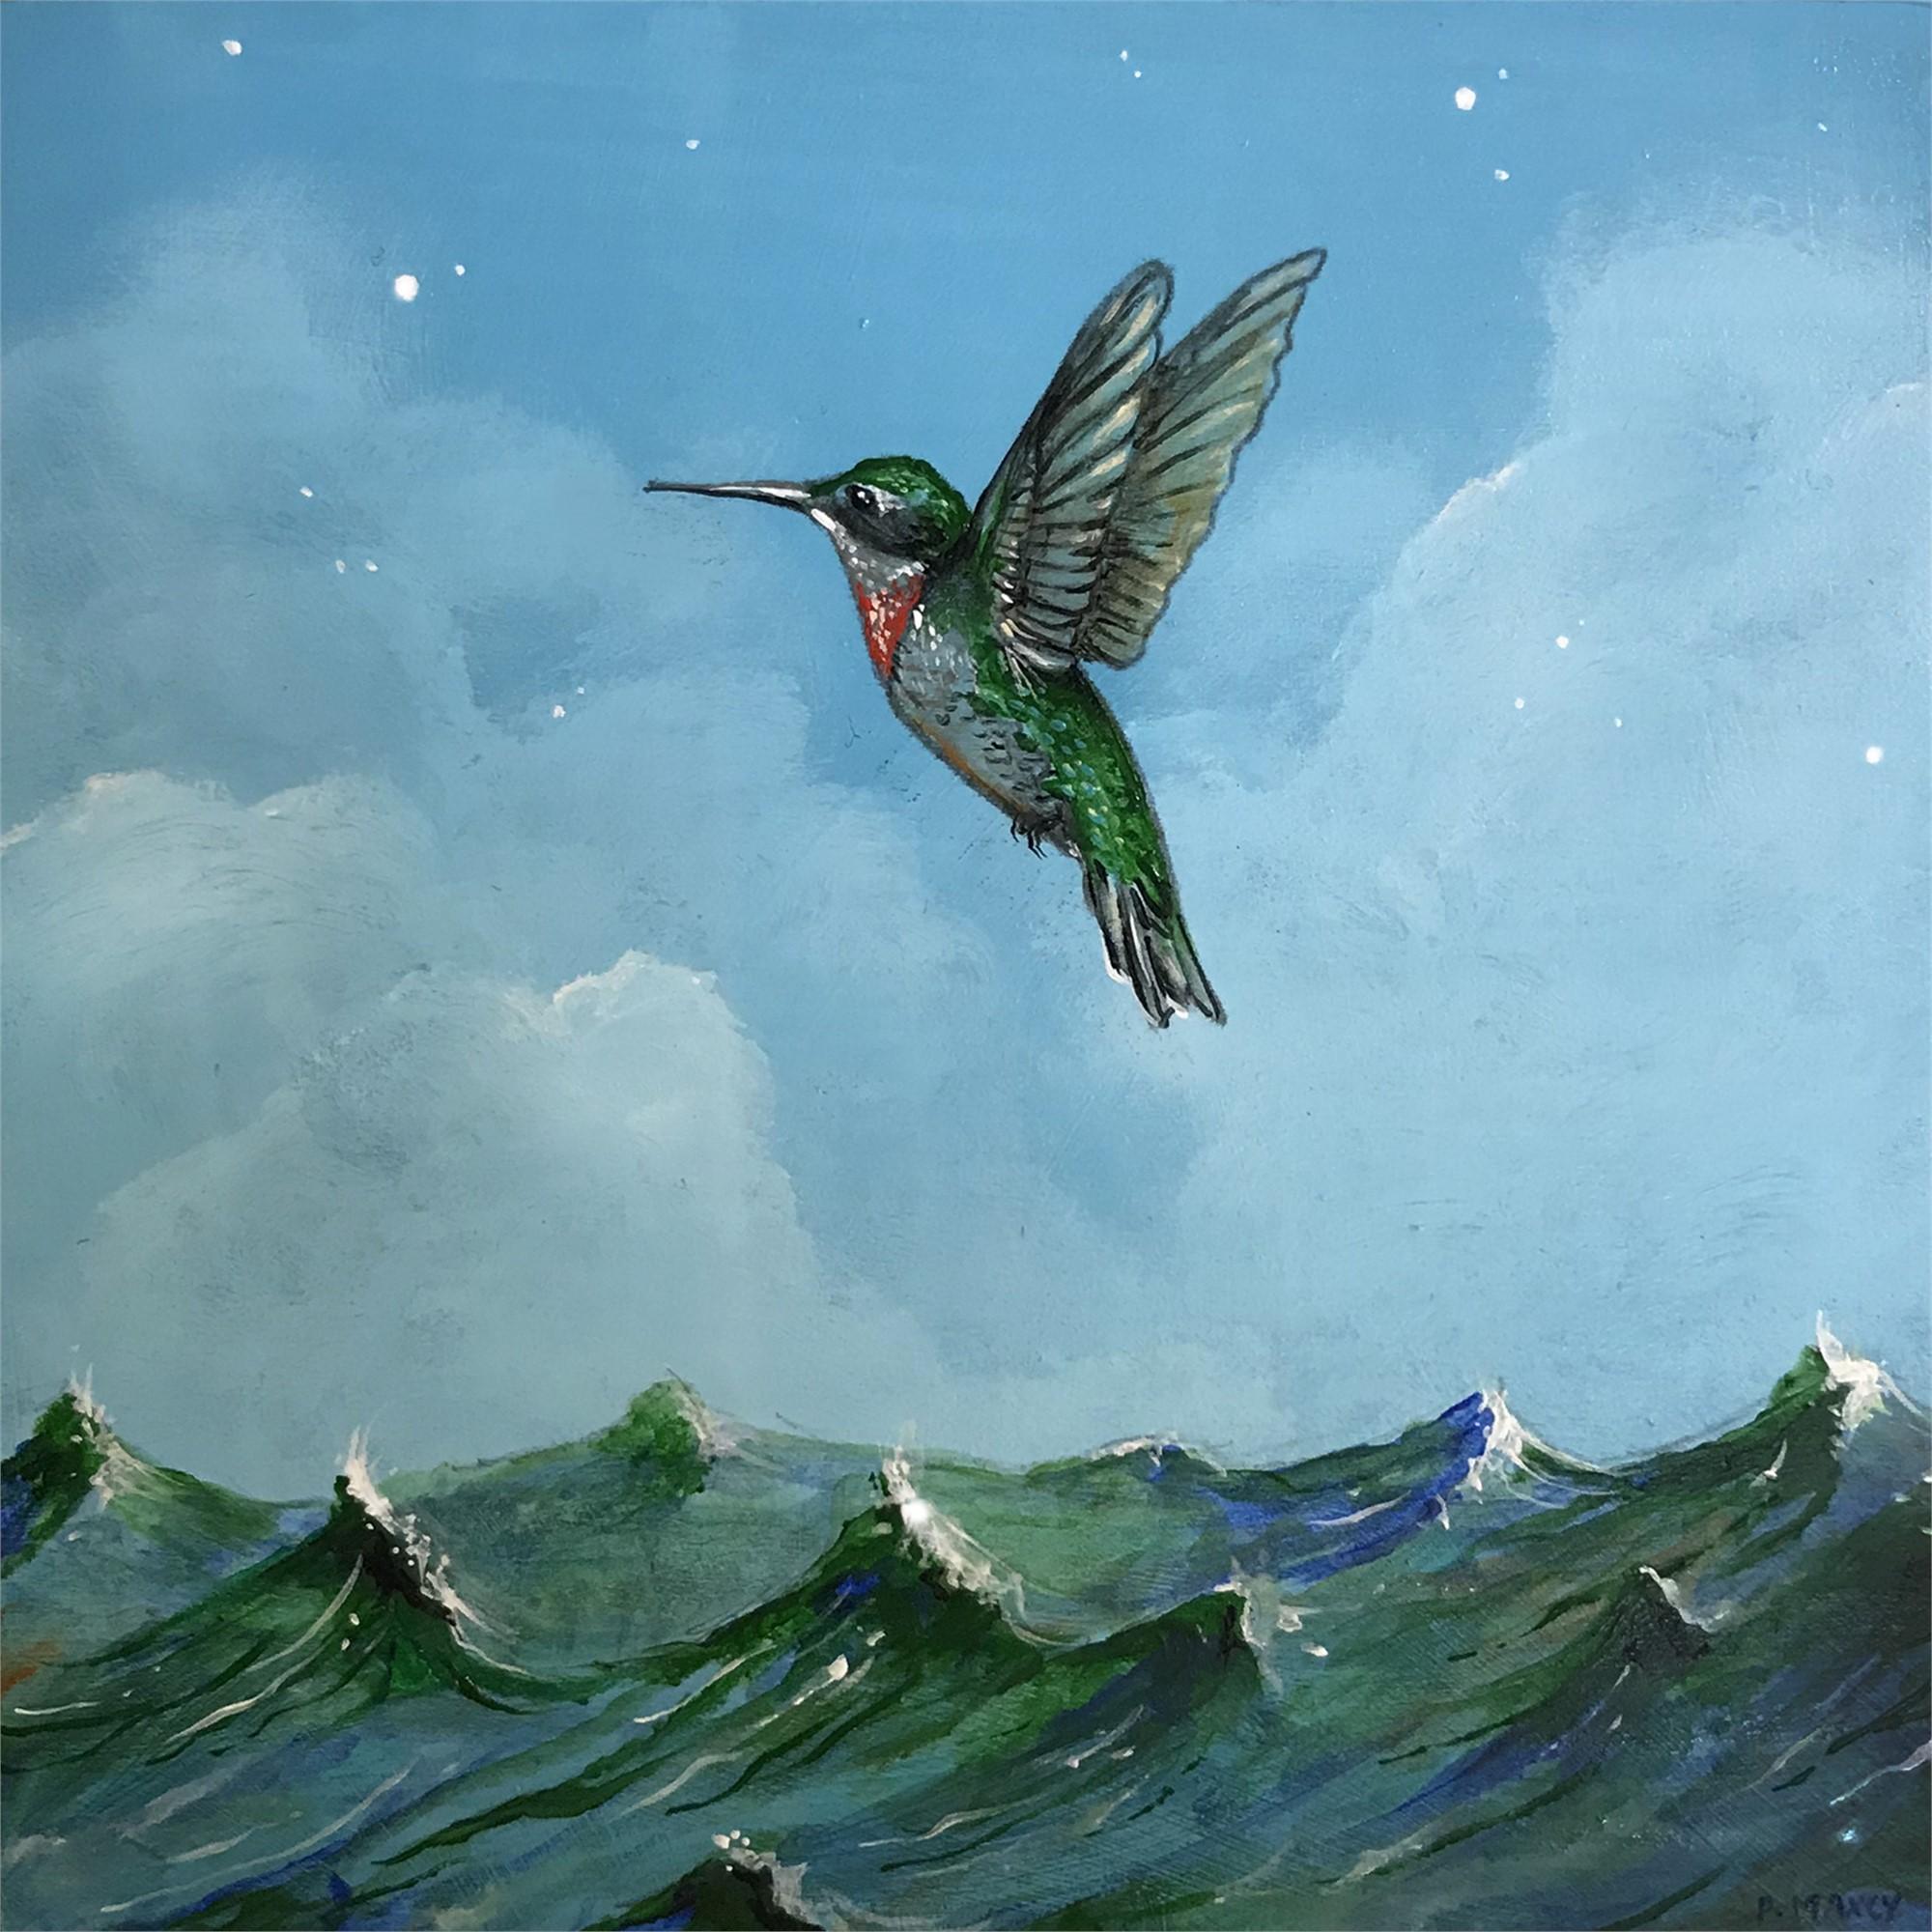 Ocean Flight by Patrick Maxcy